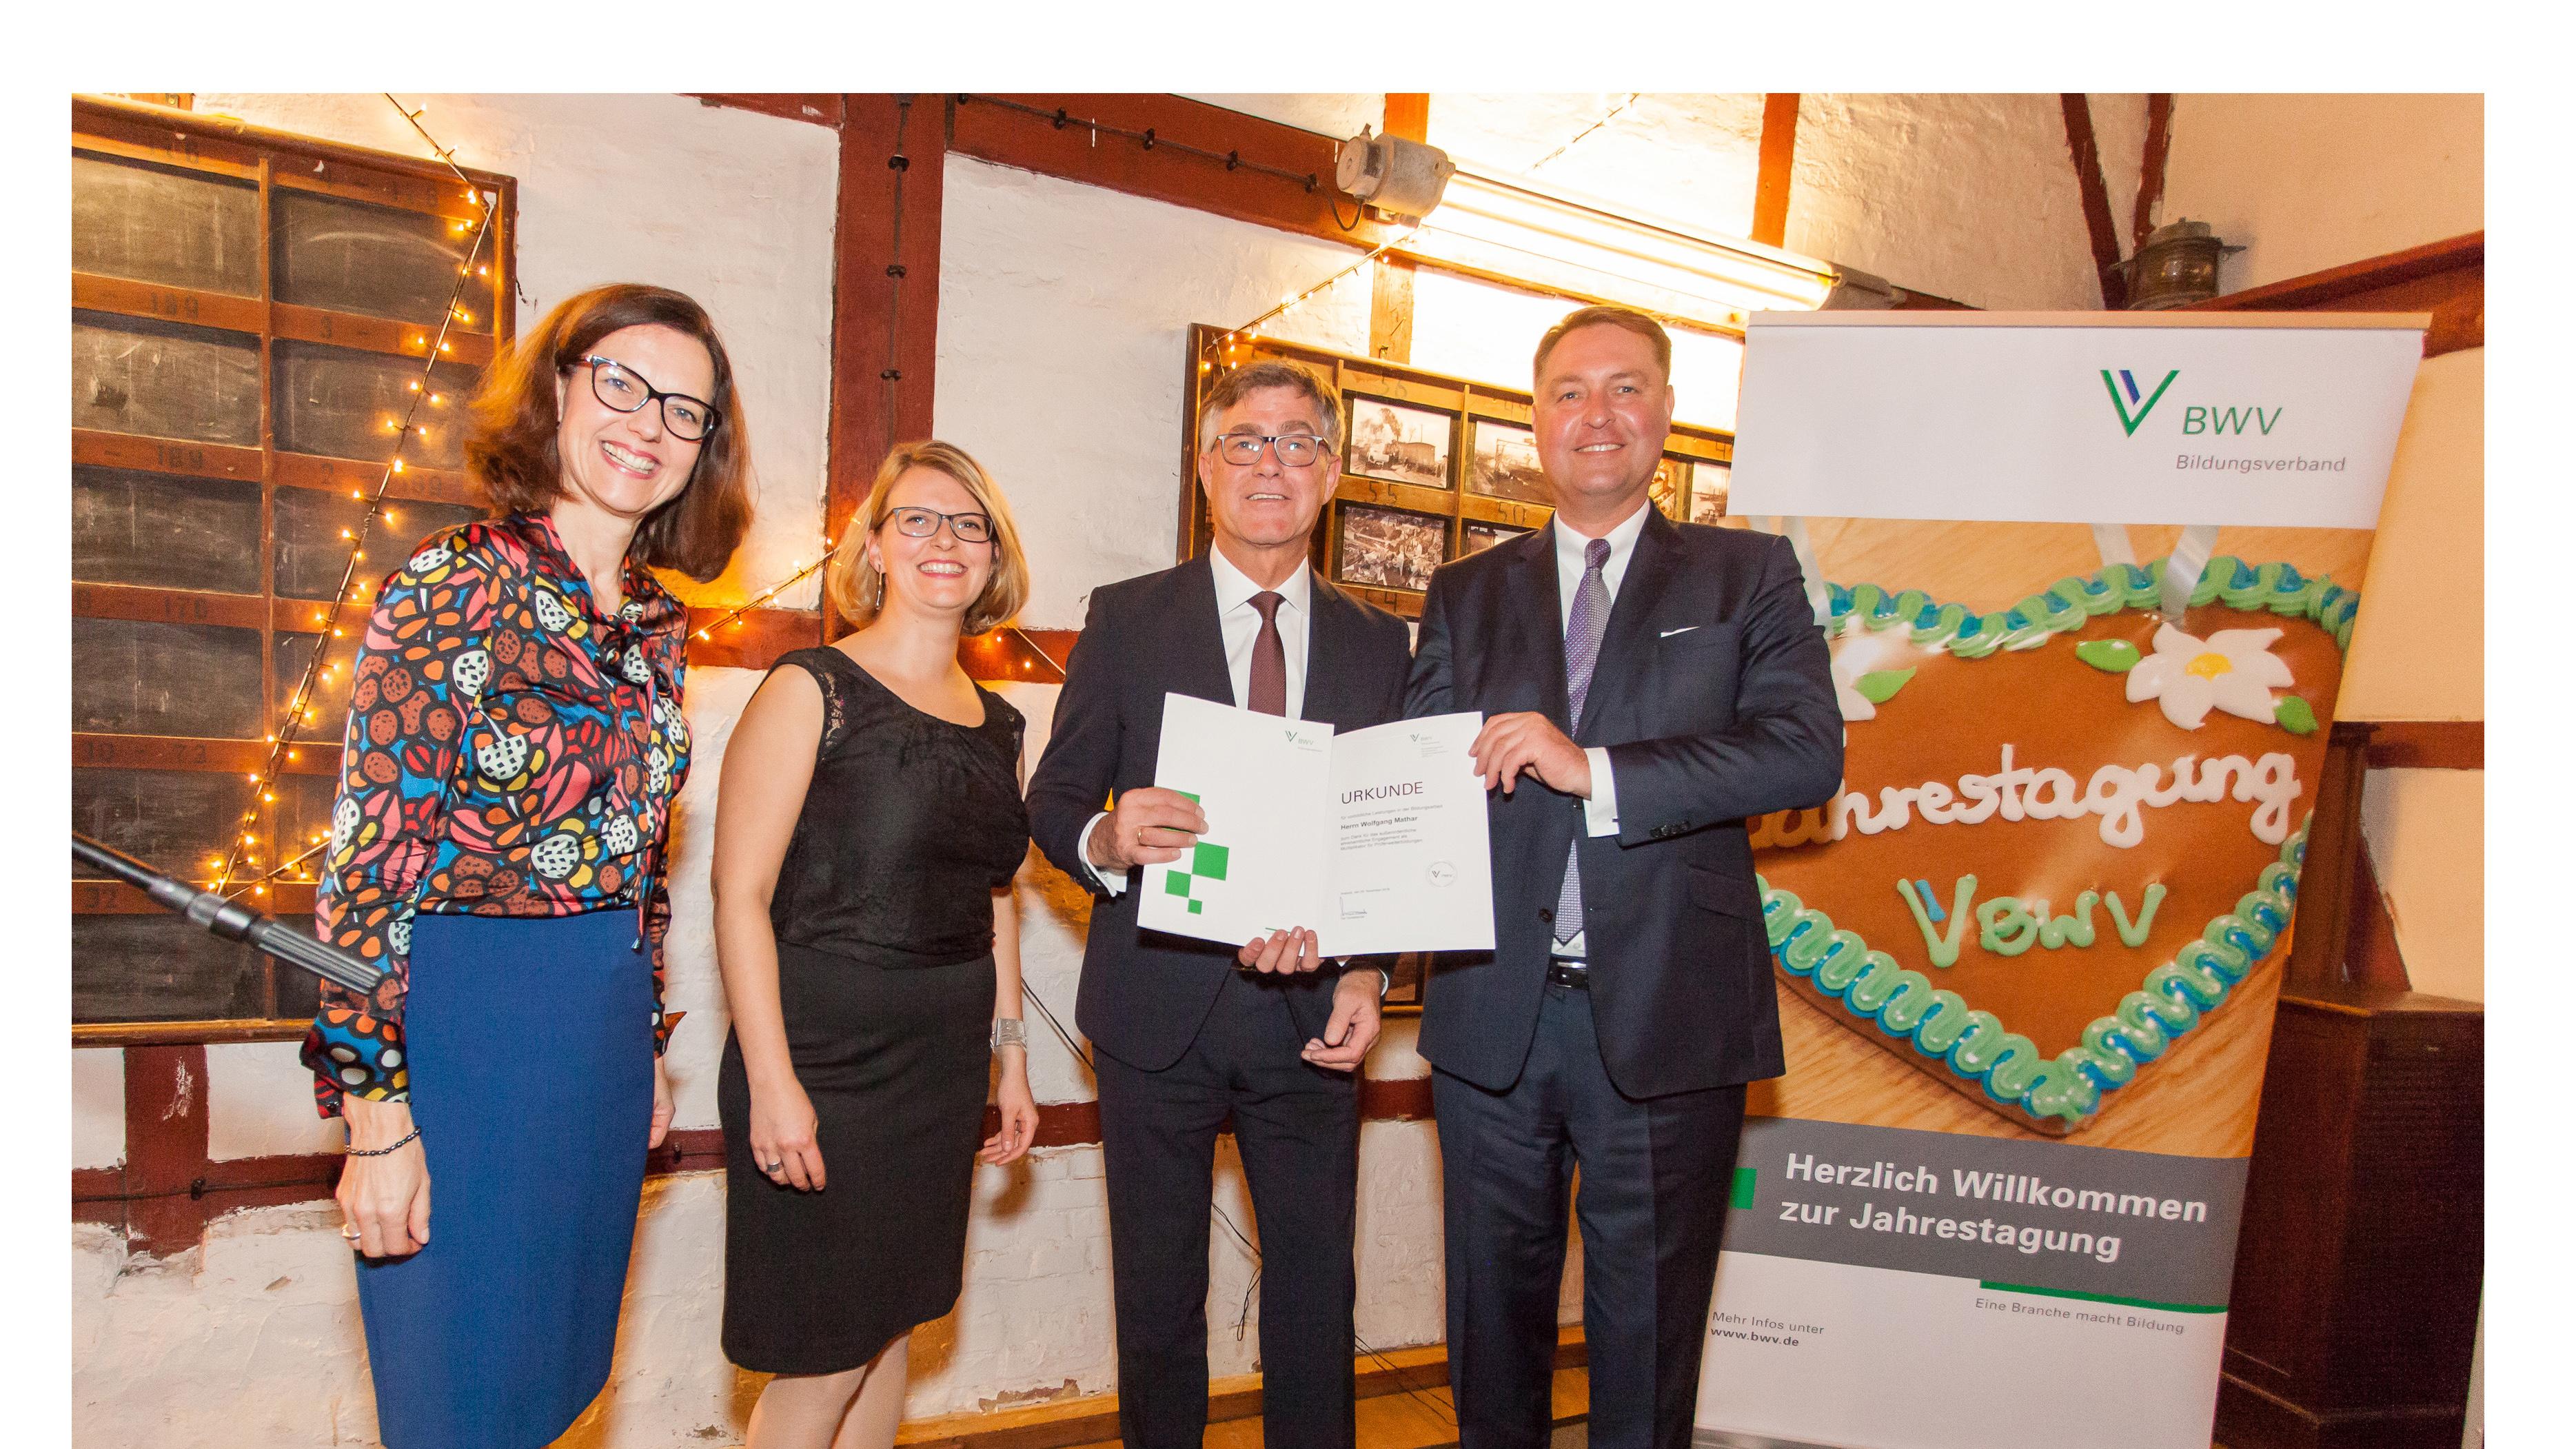 BWV Bildungsverband Jahrespreis 2018 2